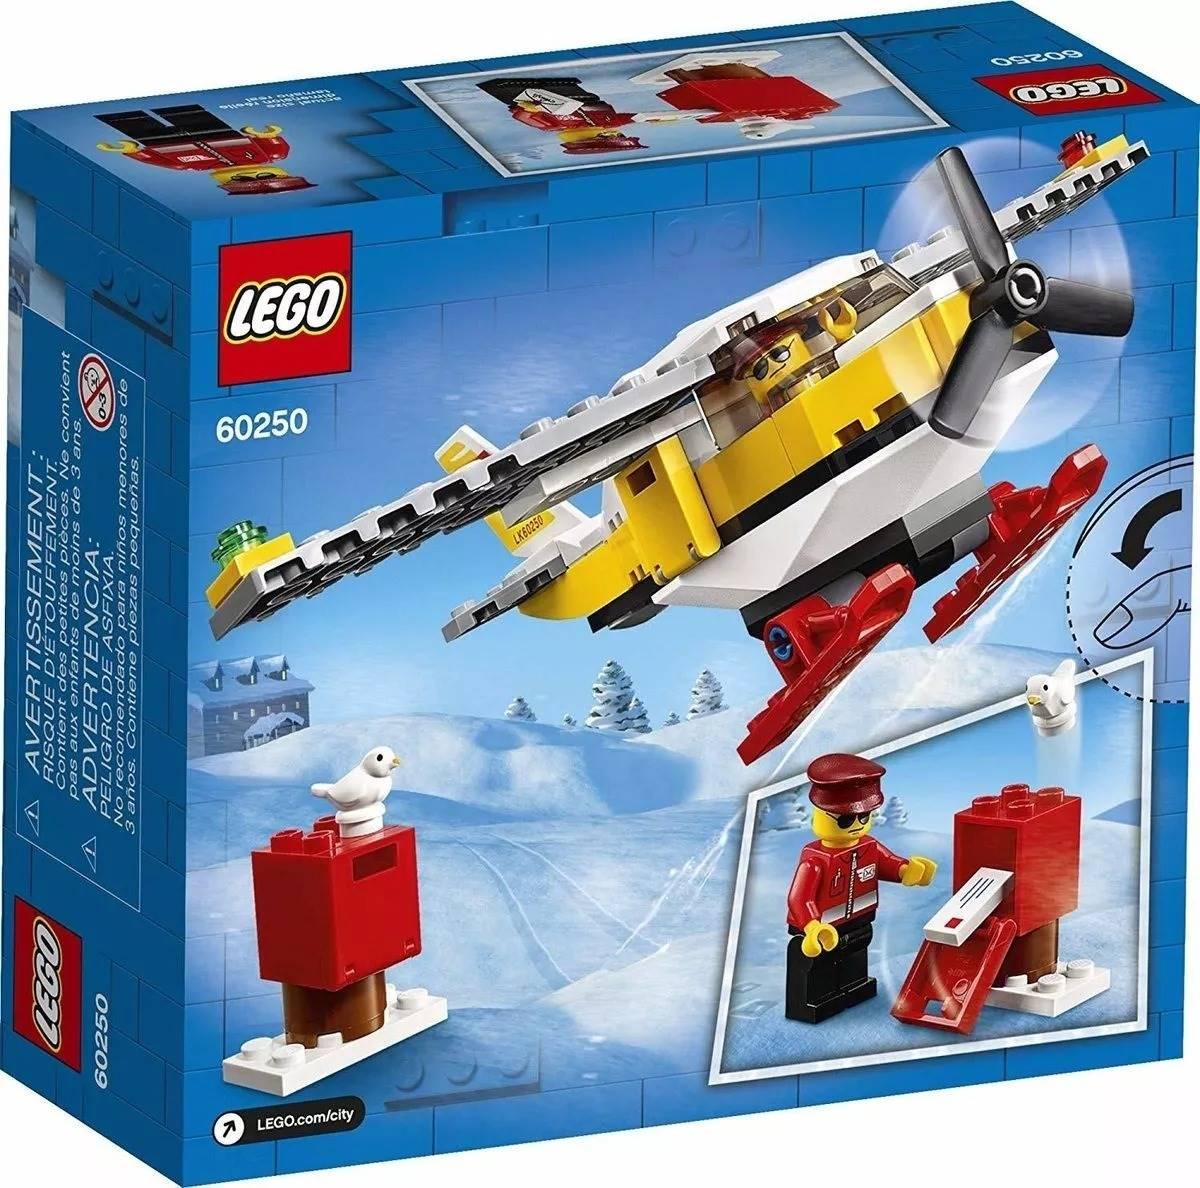 LEGO City - Aviao Correio - Lego 60250